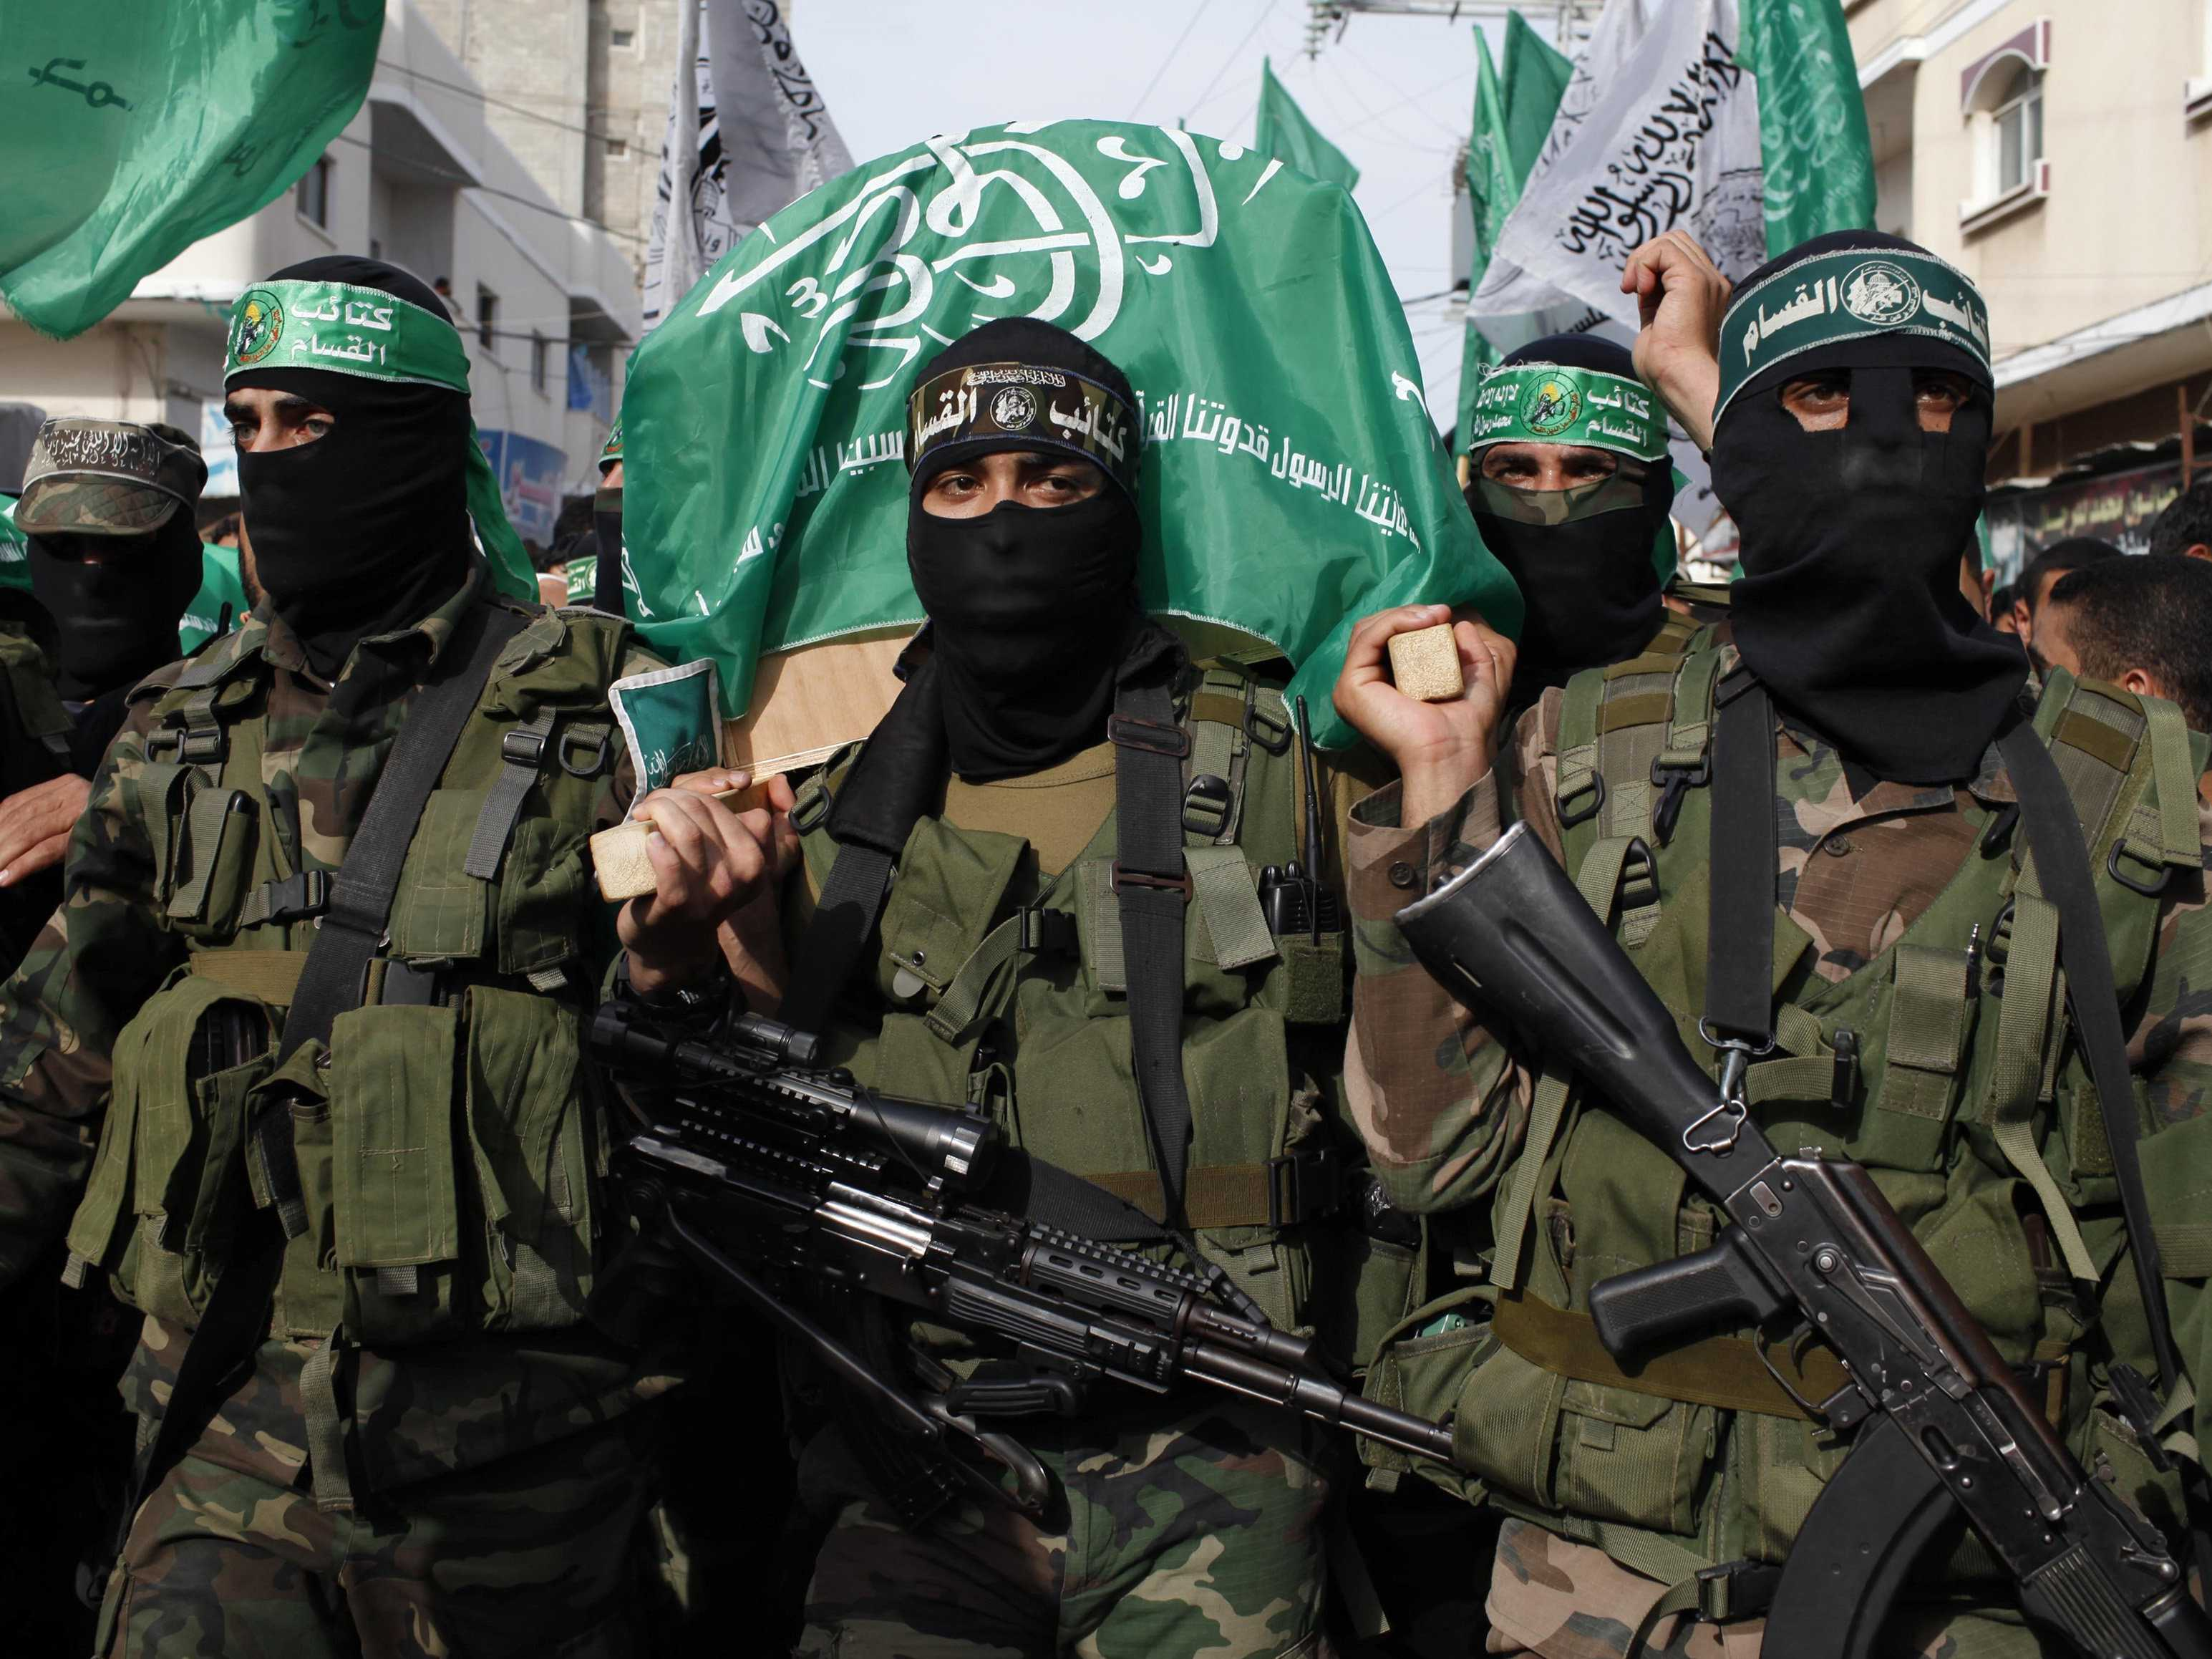 Hamas: A Social Welfare Government or War Machine? | Begin-Sadat ...